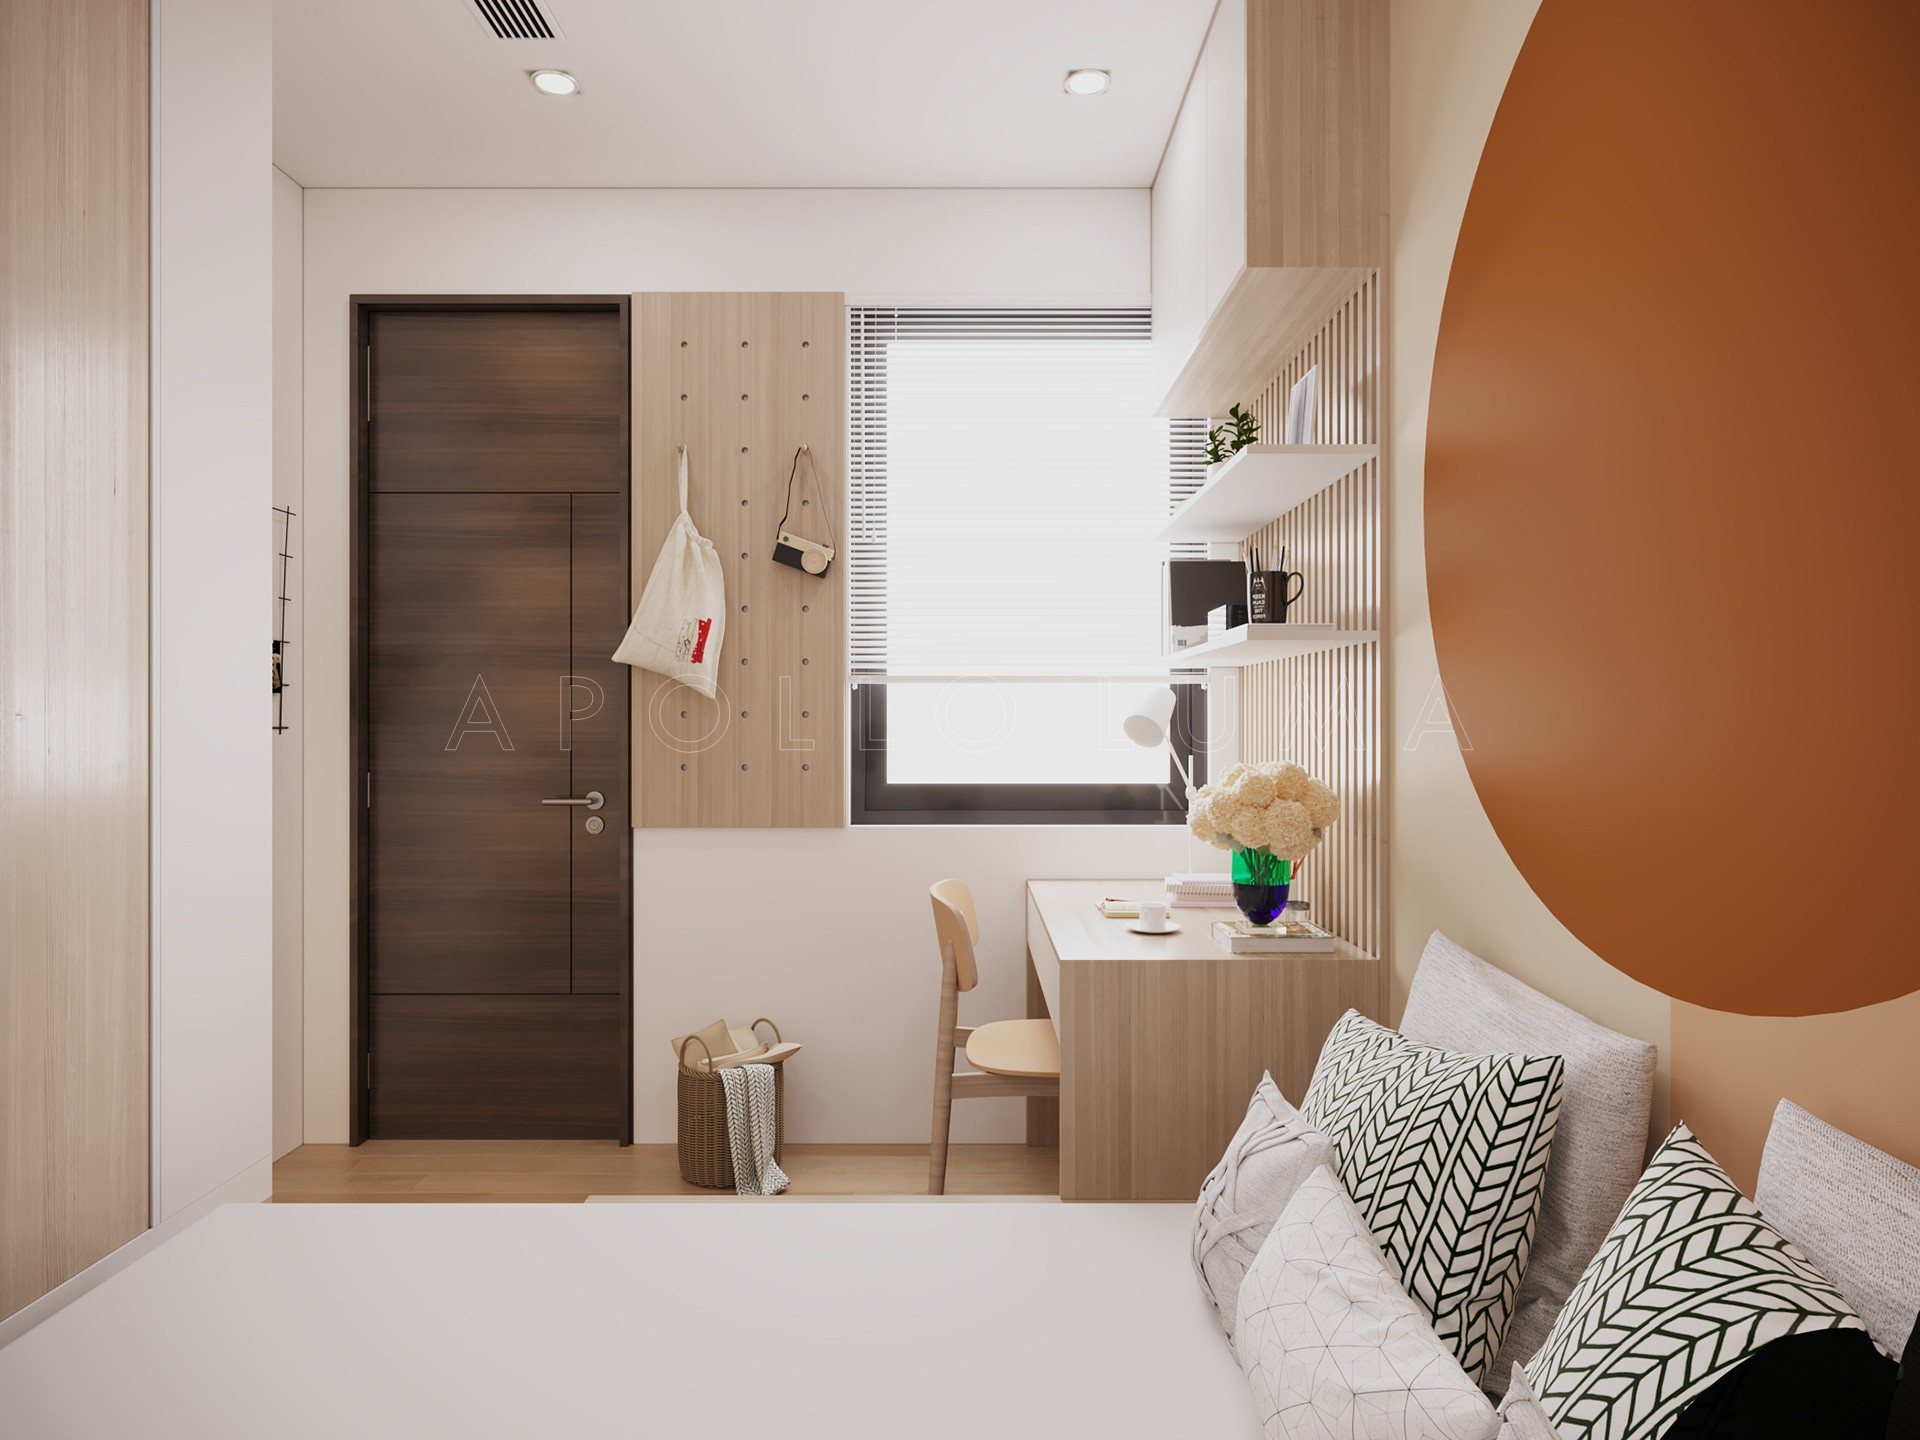 Thiết kế nội thất căn 2PN+1 (55m2) S2.09-11 Vinhomes Ocean Park